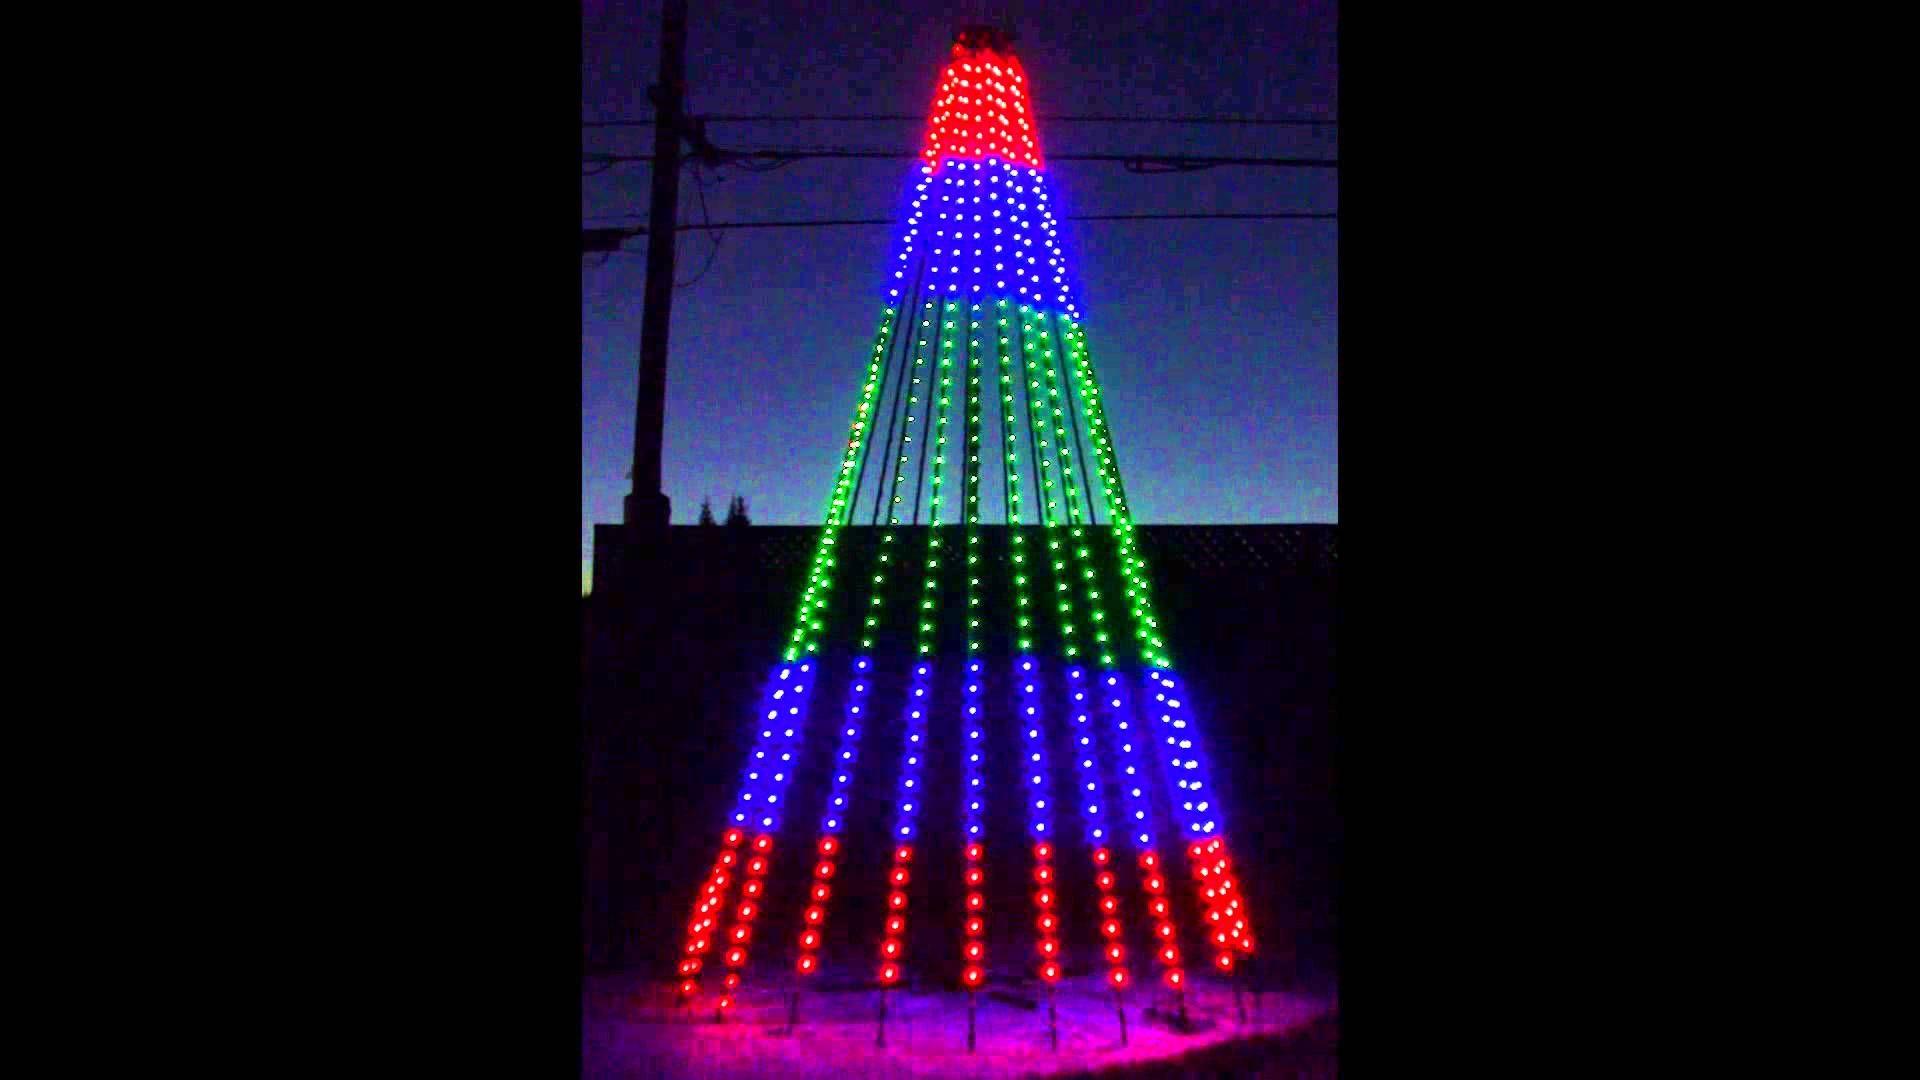 Elegant RGB Pixel Mega Tree Test. Christmas LightsChristmas DecorationsStrands